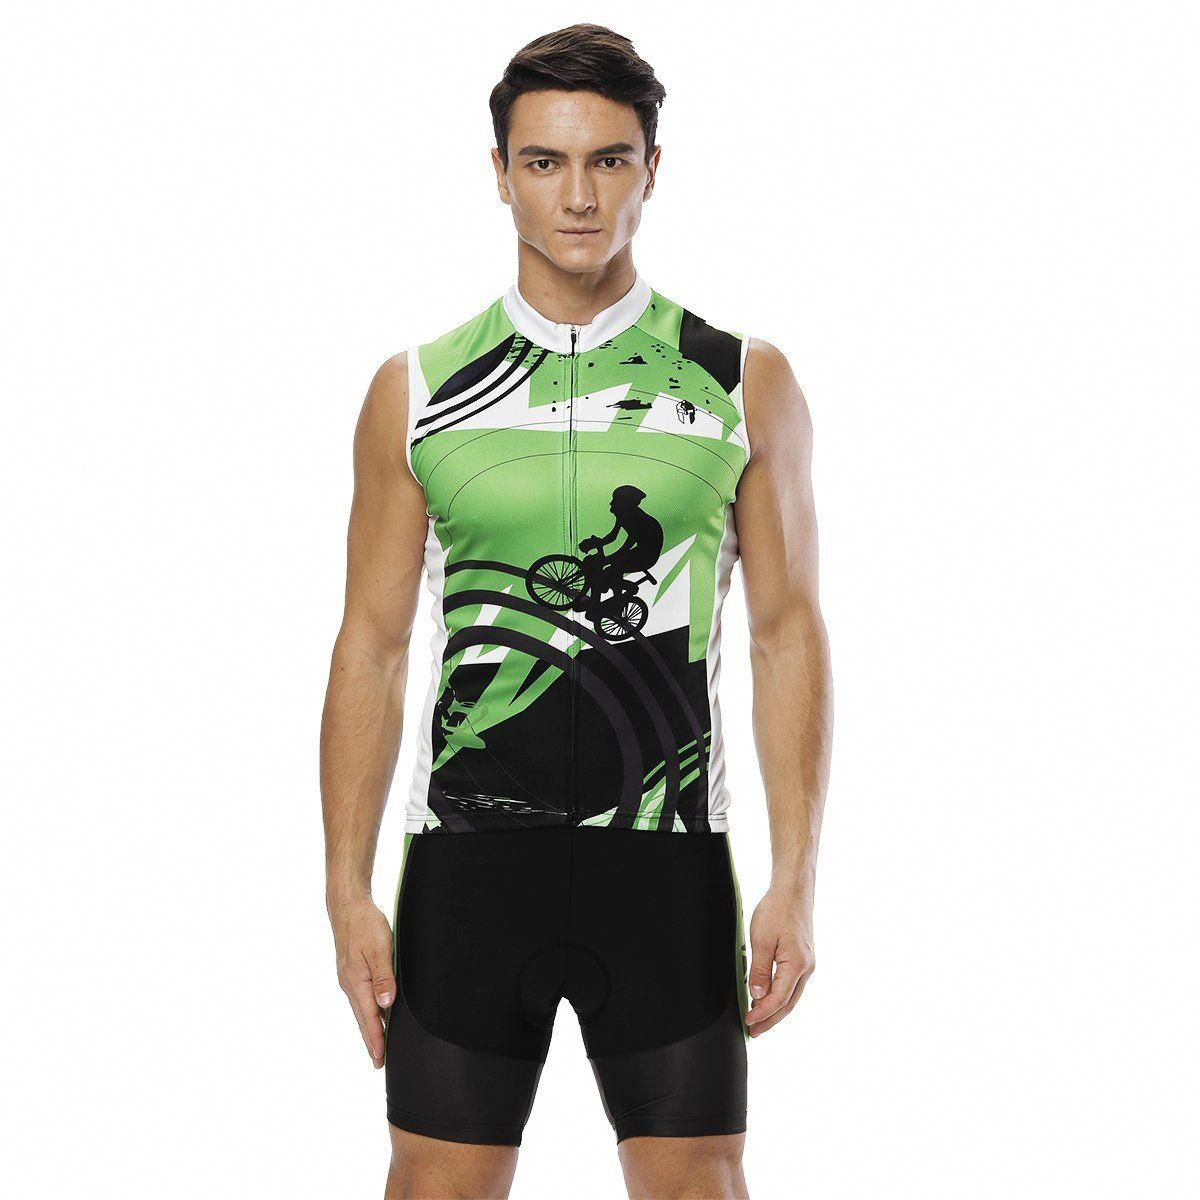 Green Cyclist Men S Cycling Sleeveless Bike Jersey Kit T Shirt